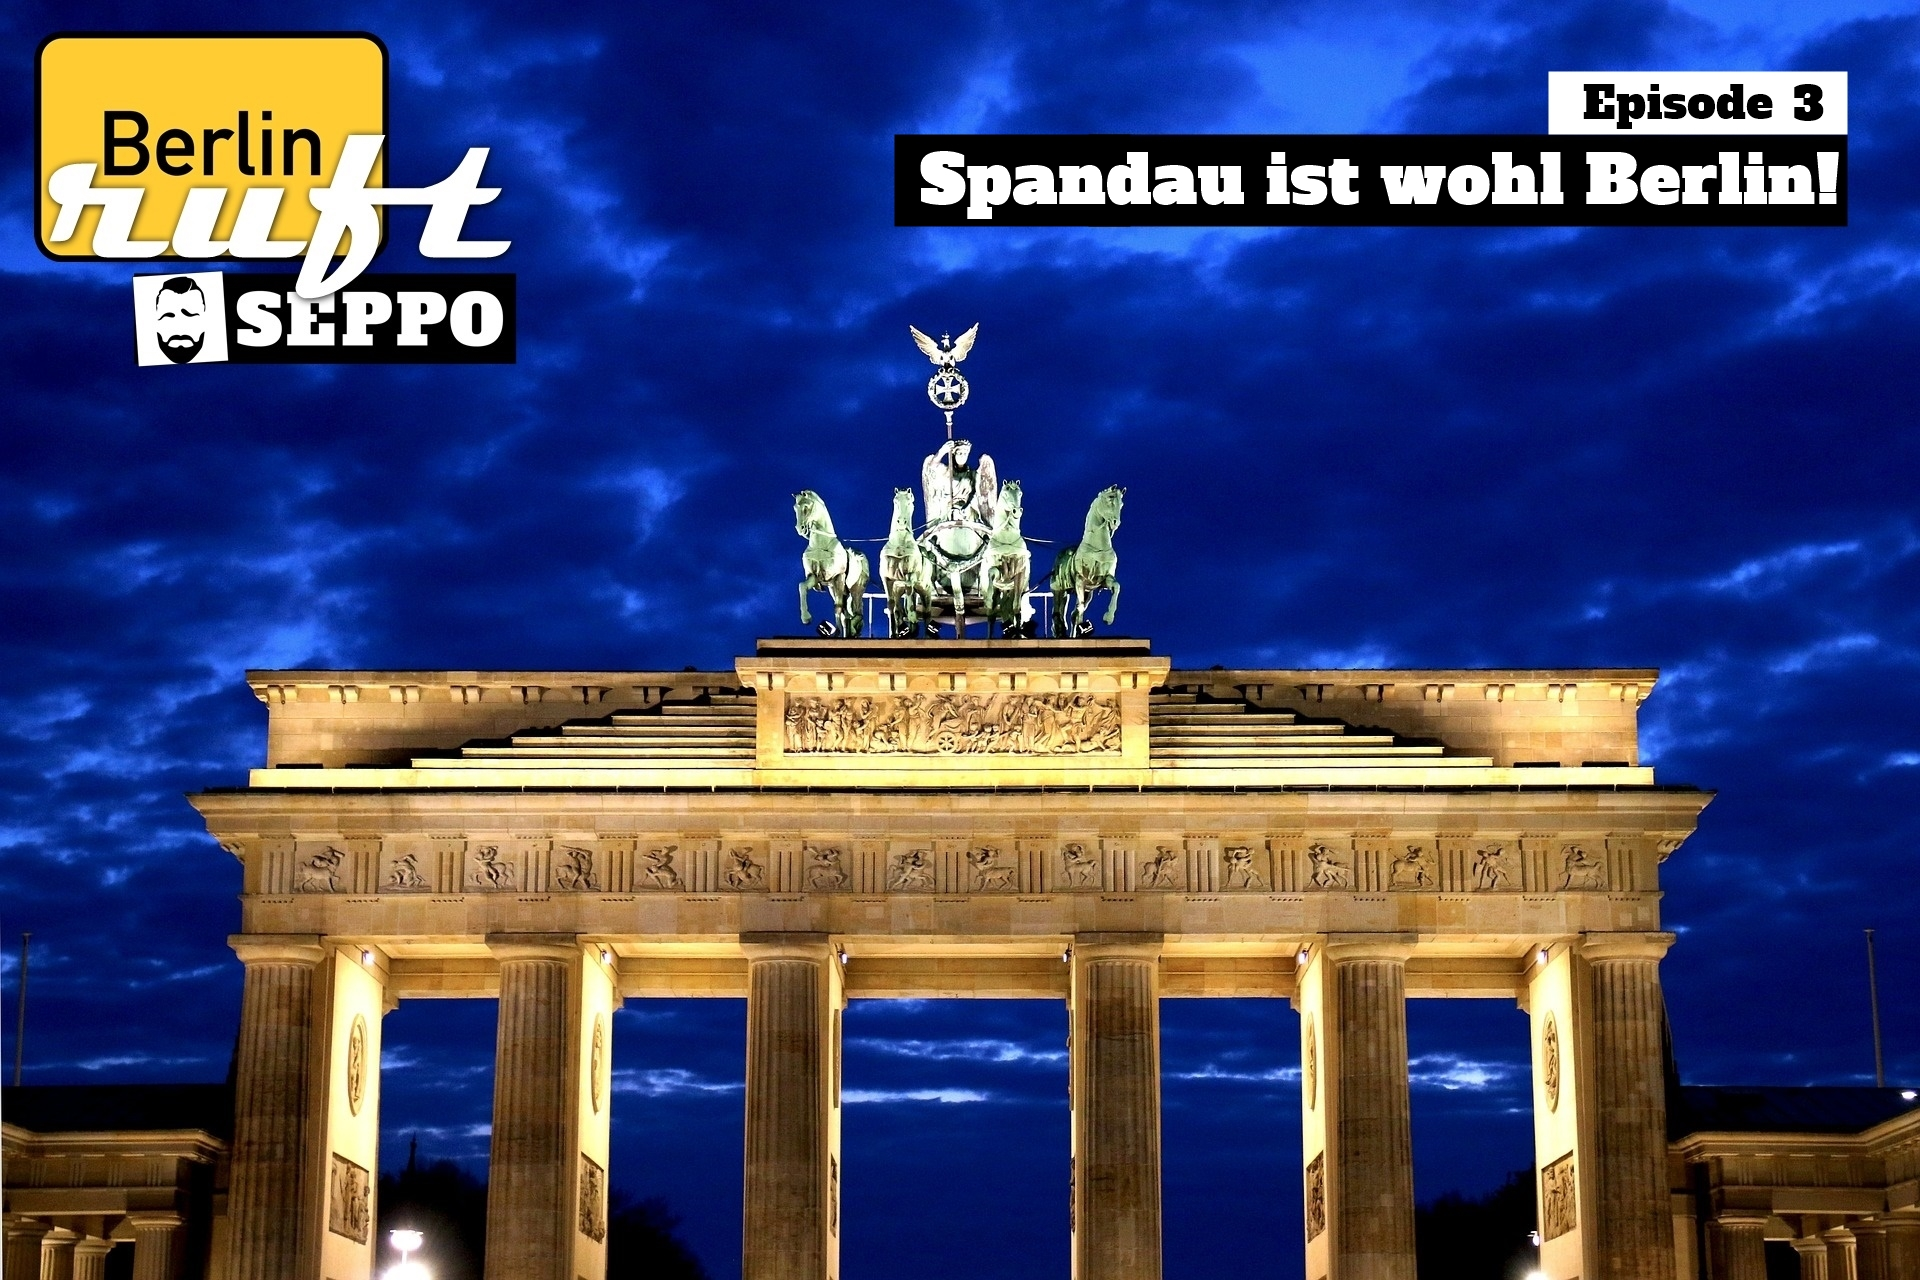 Spandau ist wohl Berlin! – Berlin ruft Seppo S!E§, nein, S1E3